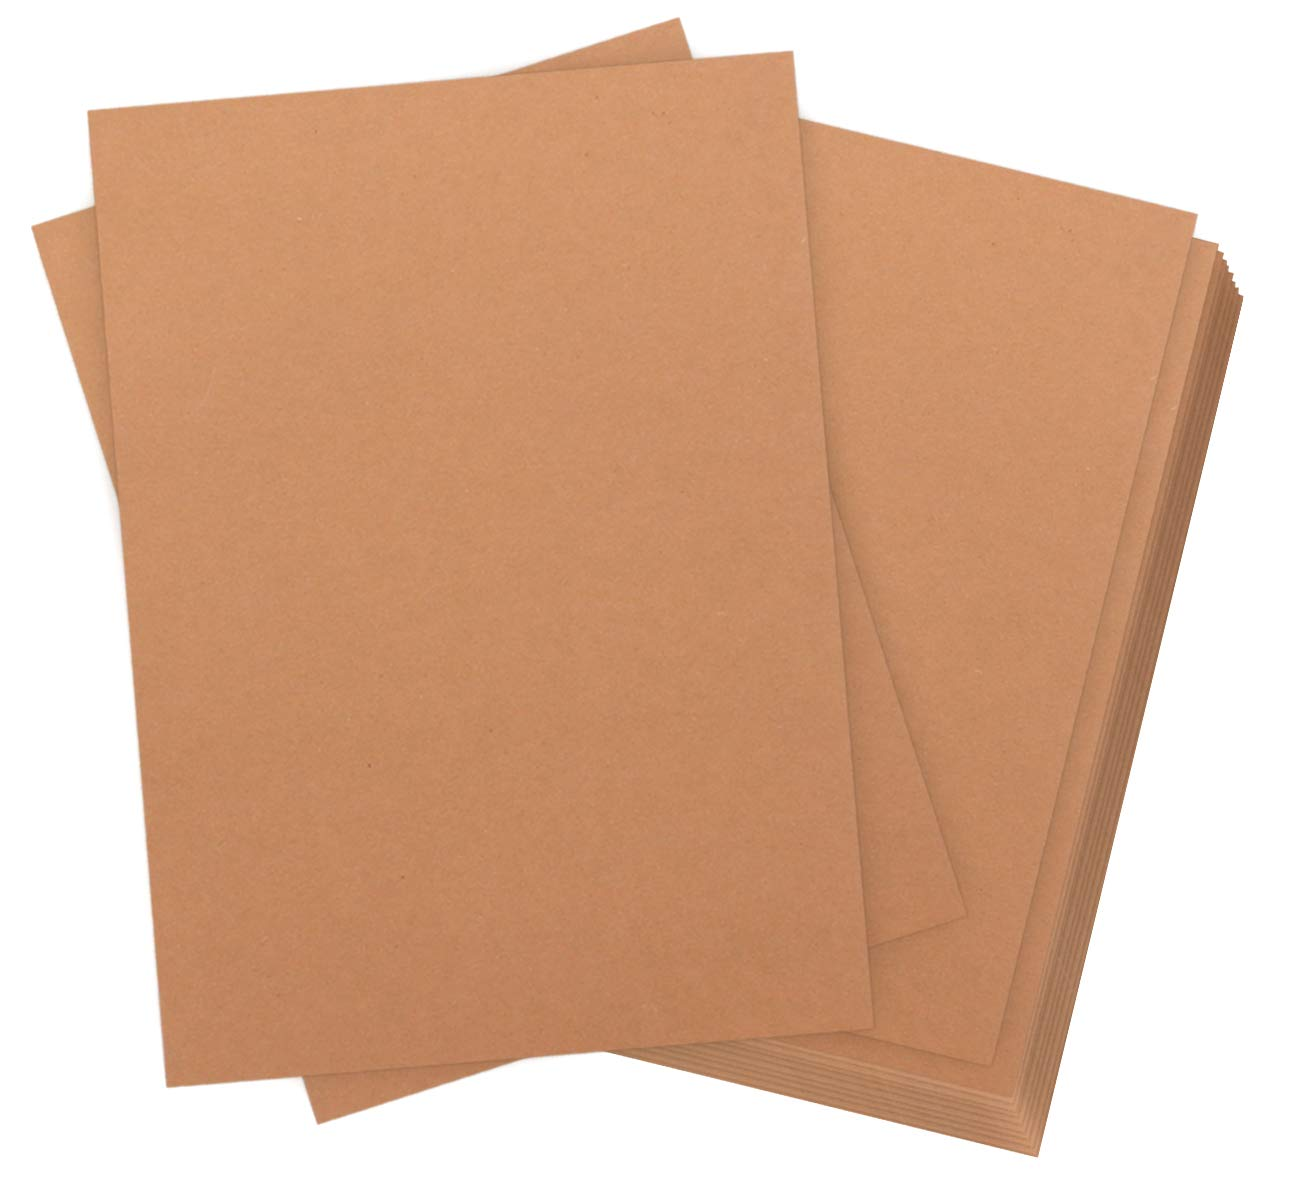 60 Blätter Kraftpapier DIN A4 Kraftkarton 320 g Qualität Absofine Naturkarton in Hochwertiger Qualität Kraftkarte Recycelt